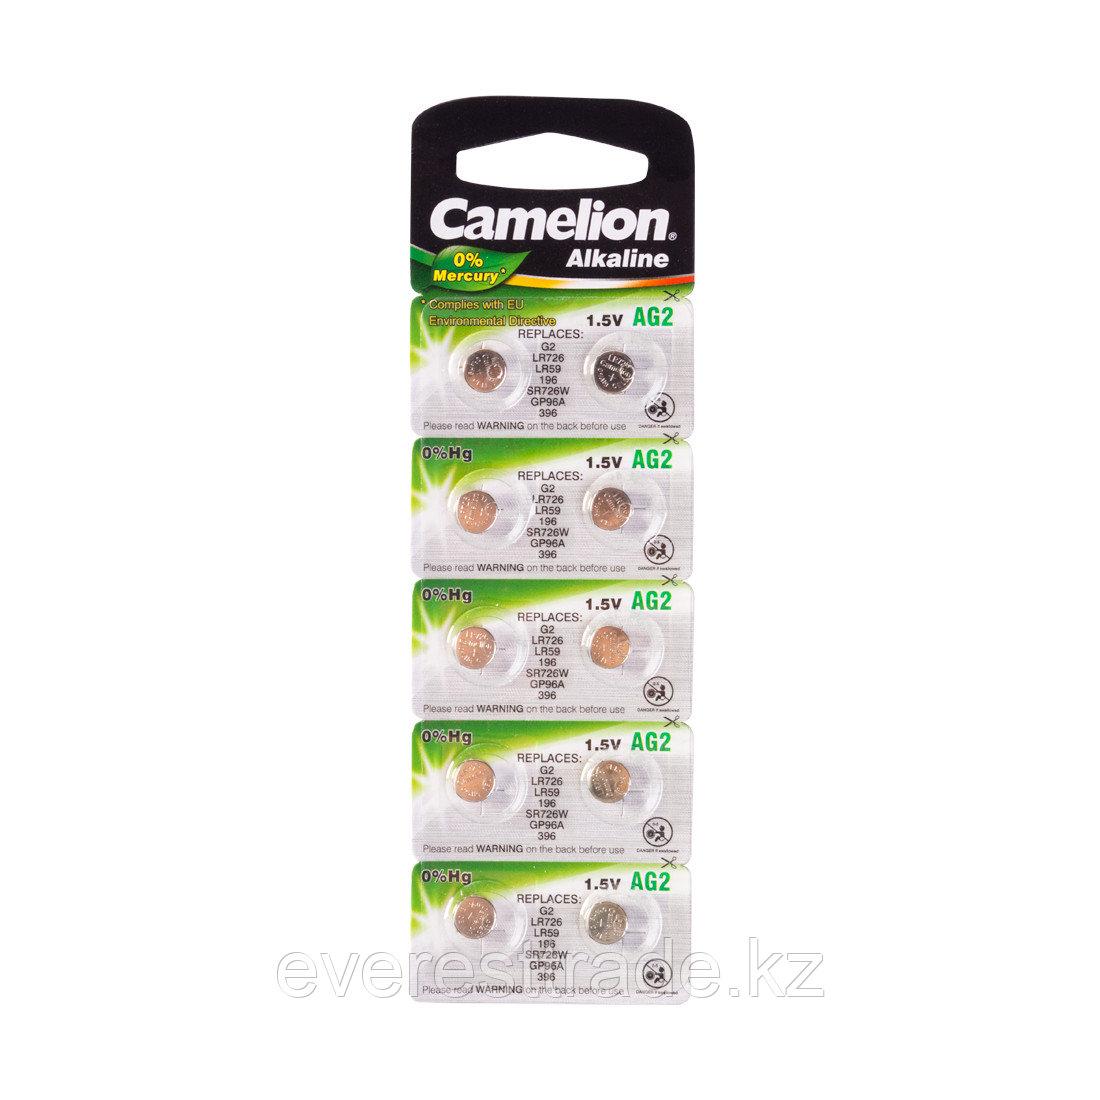 Camelion Батарейки,CAMELION, AG2-BP10, Alkaline, AG2, 1.5V, 0% Ртути, 10 шт. в блистере